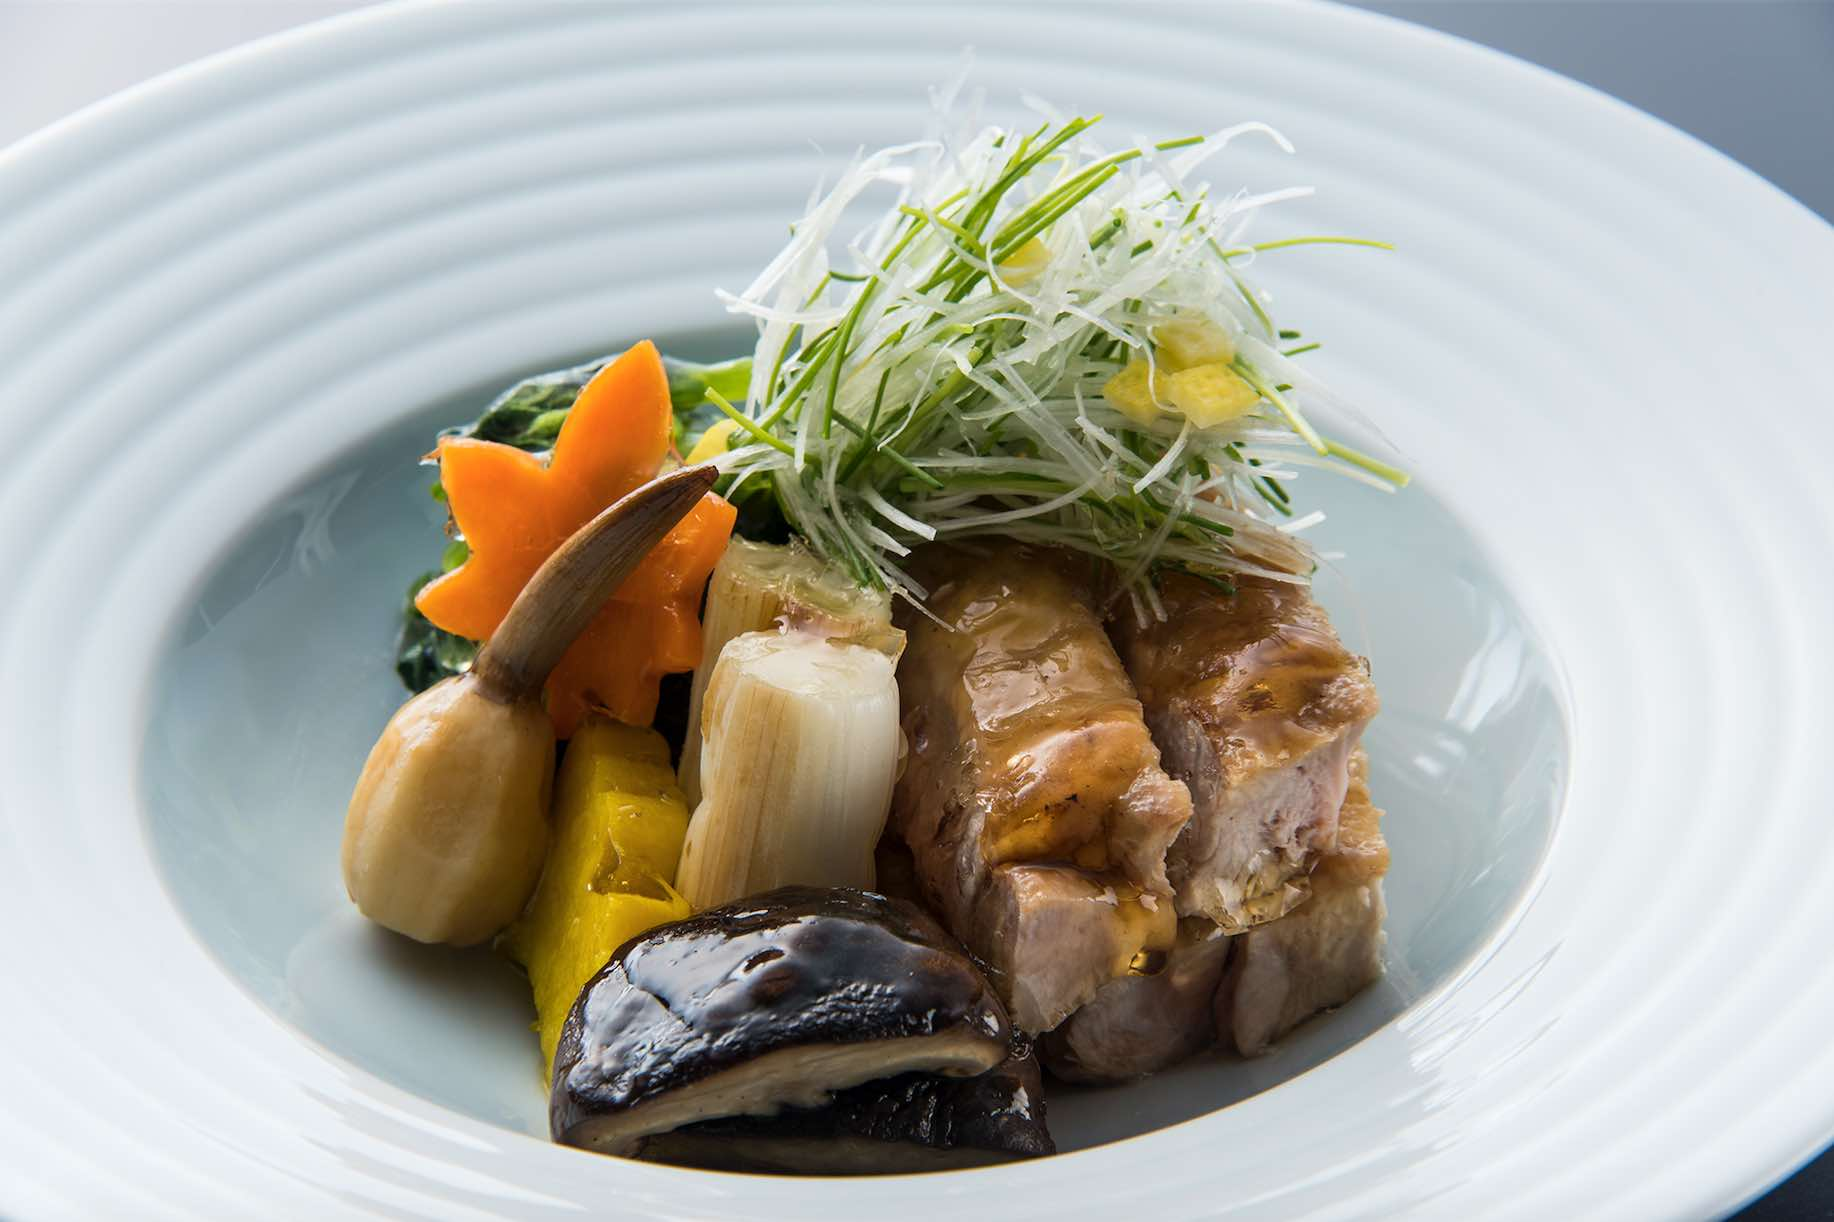 fried-tilefish-with-sauteed-abalone-shimane-prefecture-japan-aspirantsg